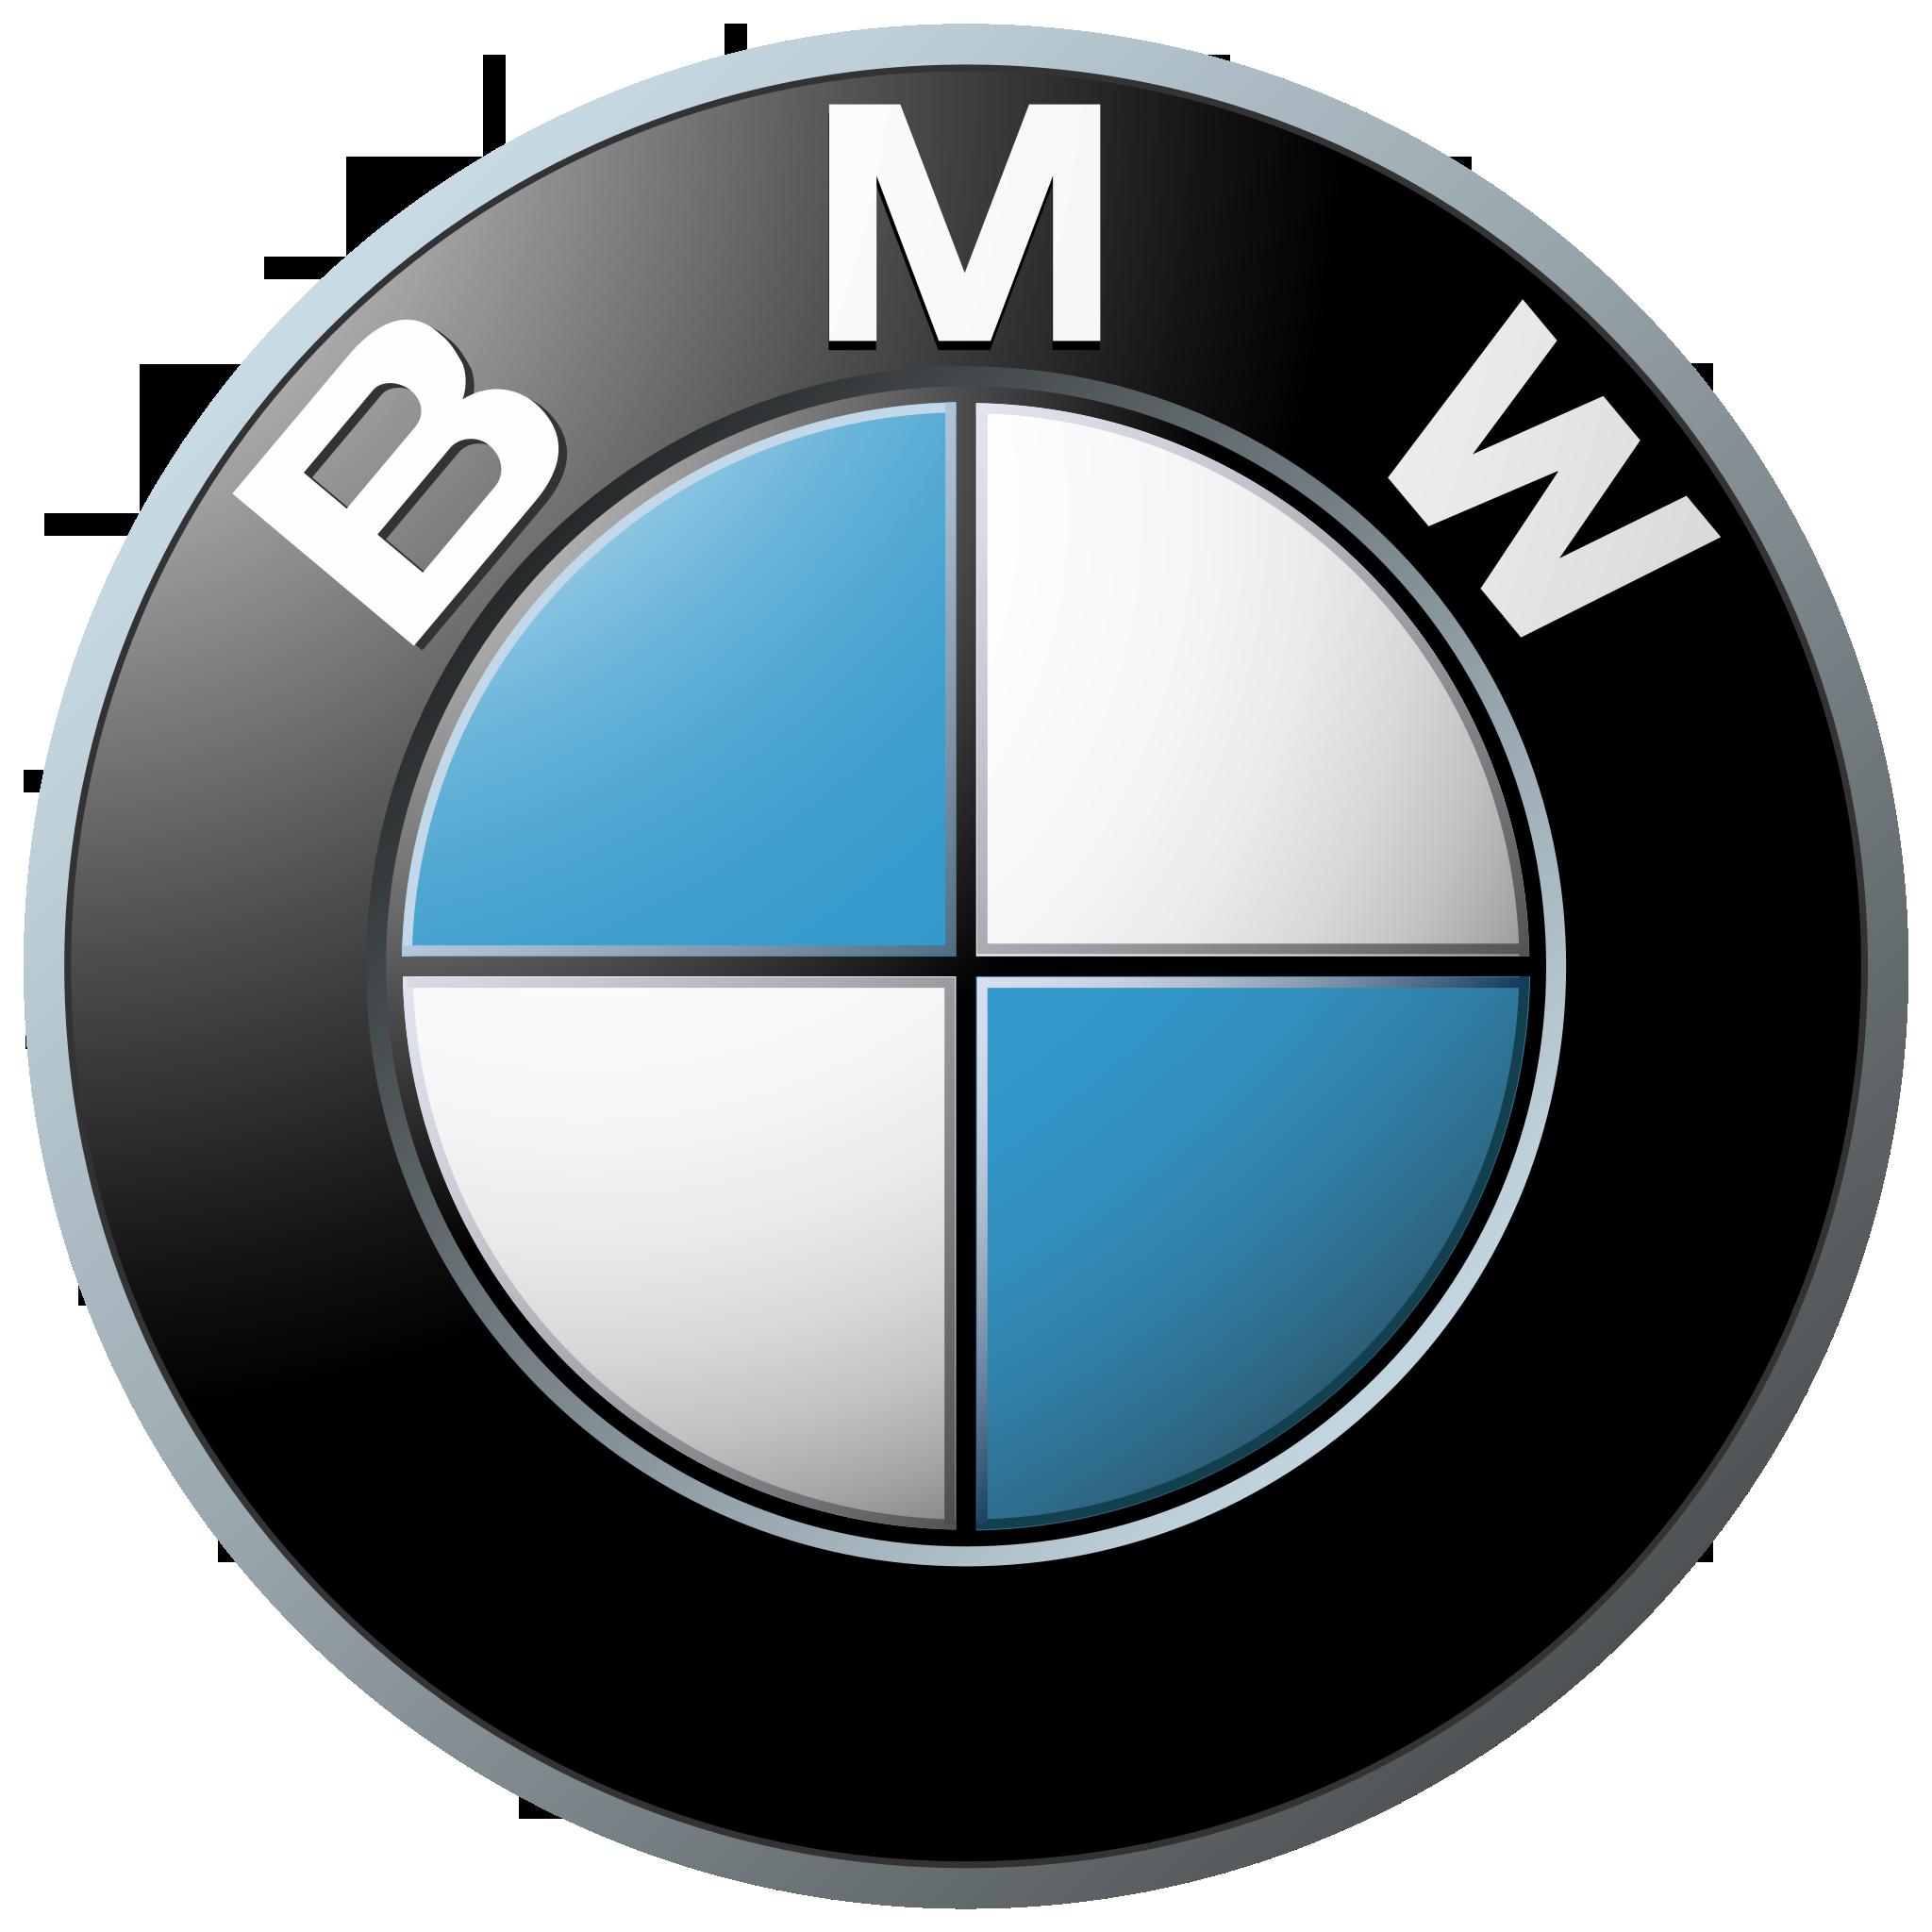 логотип bmw png